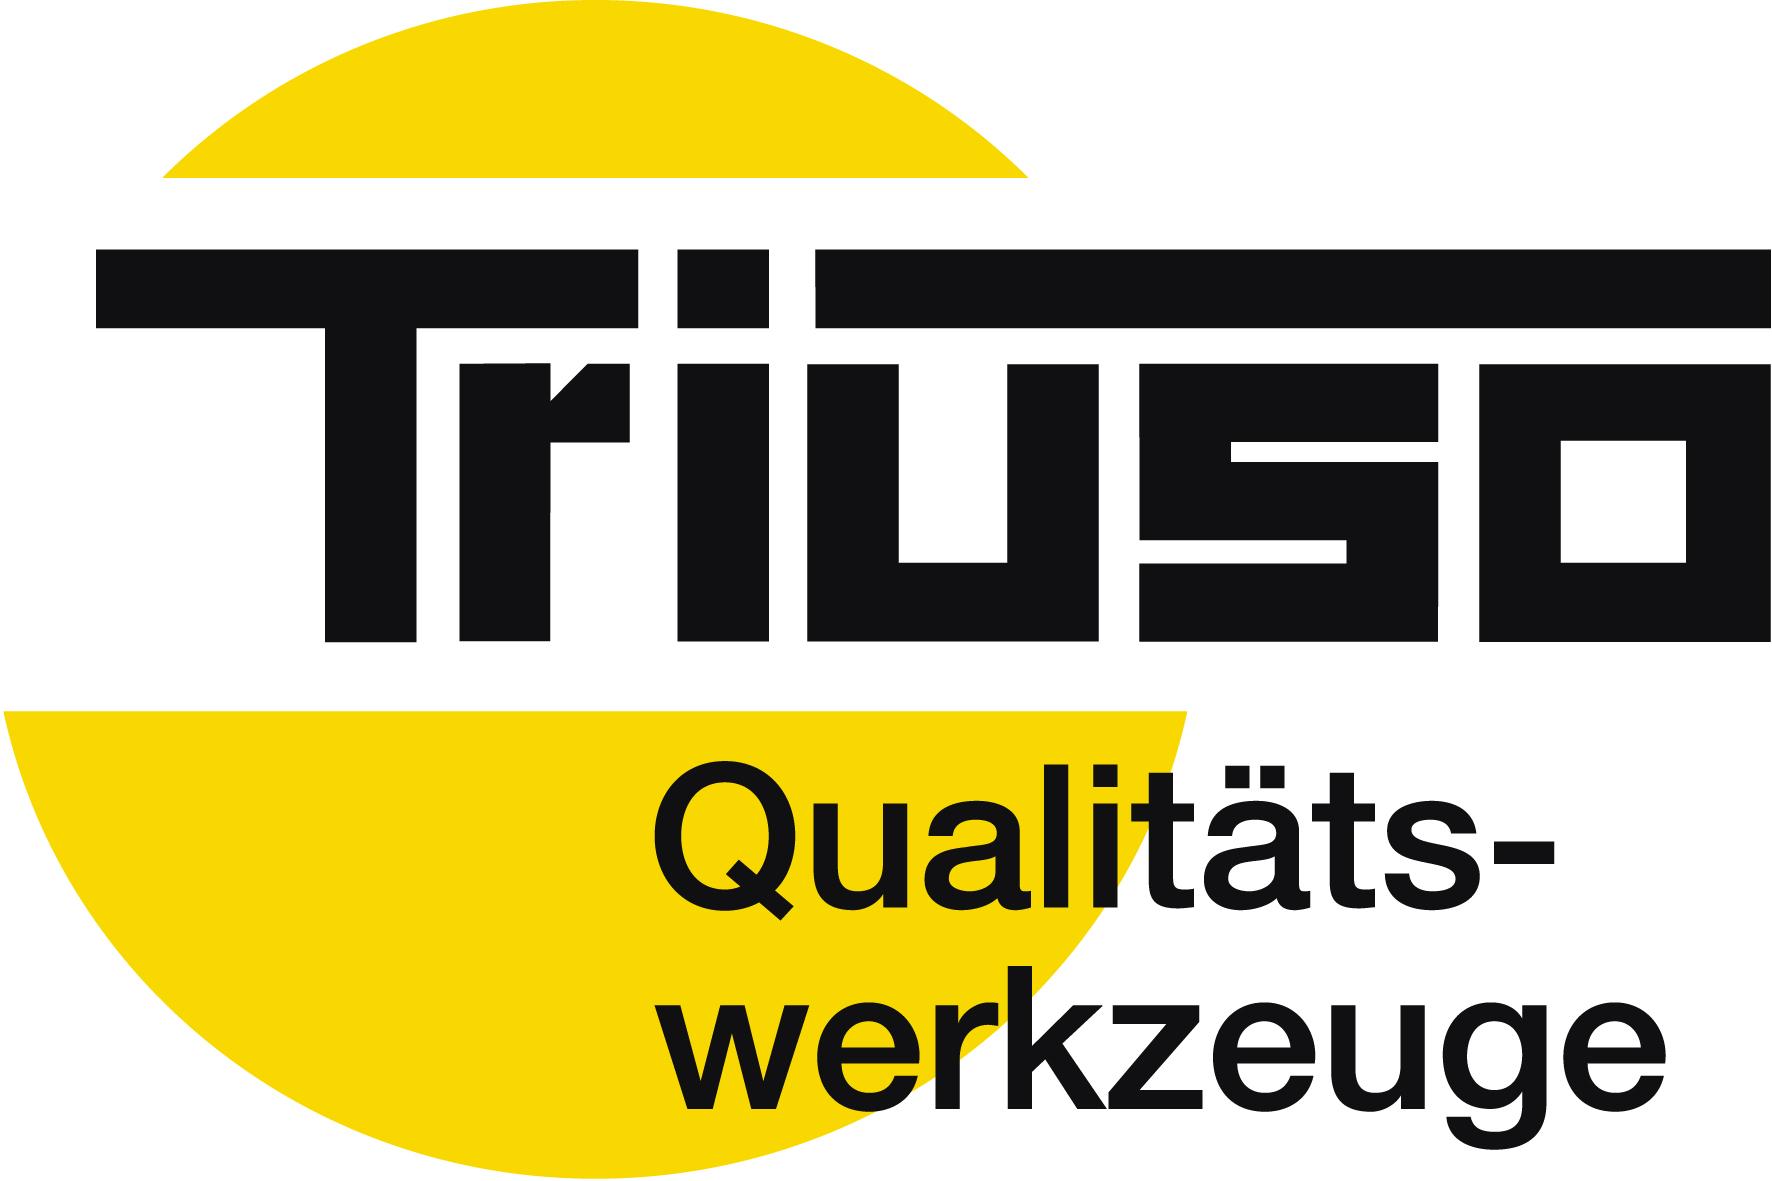 https://bilder.peters-living.de/triuso/logo/logo.jpg